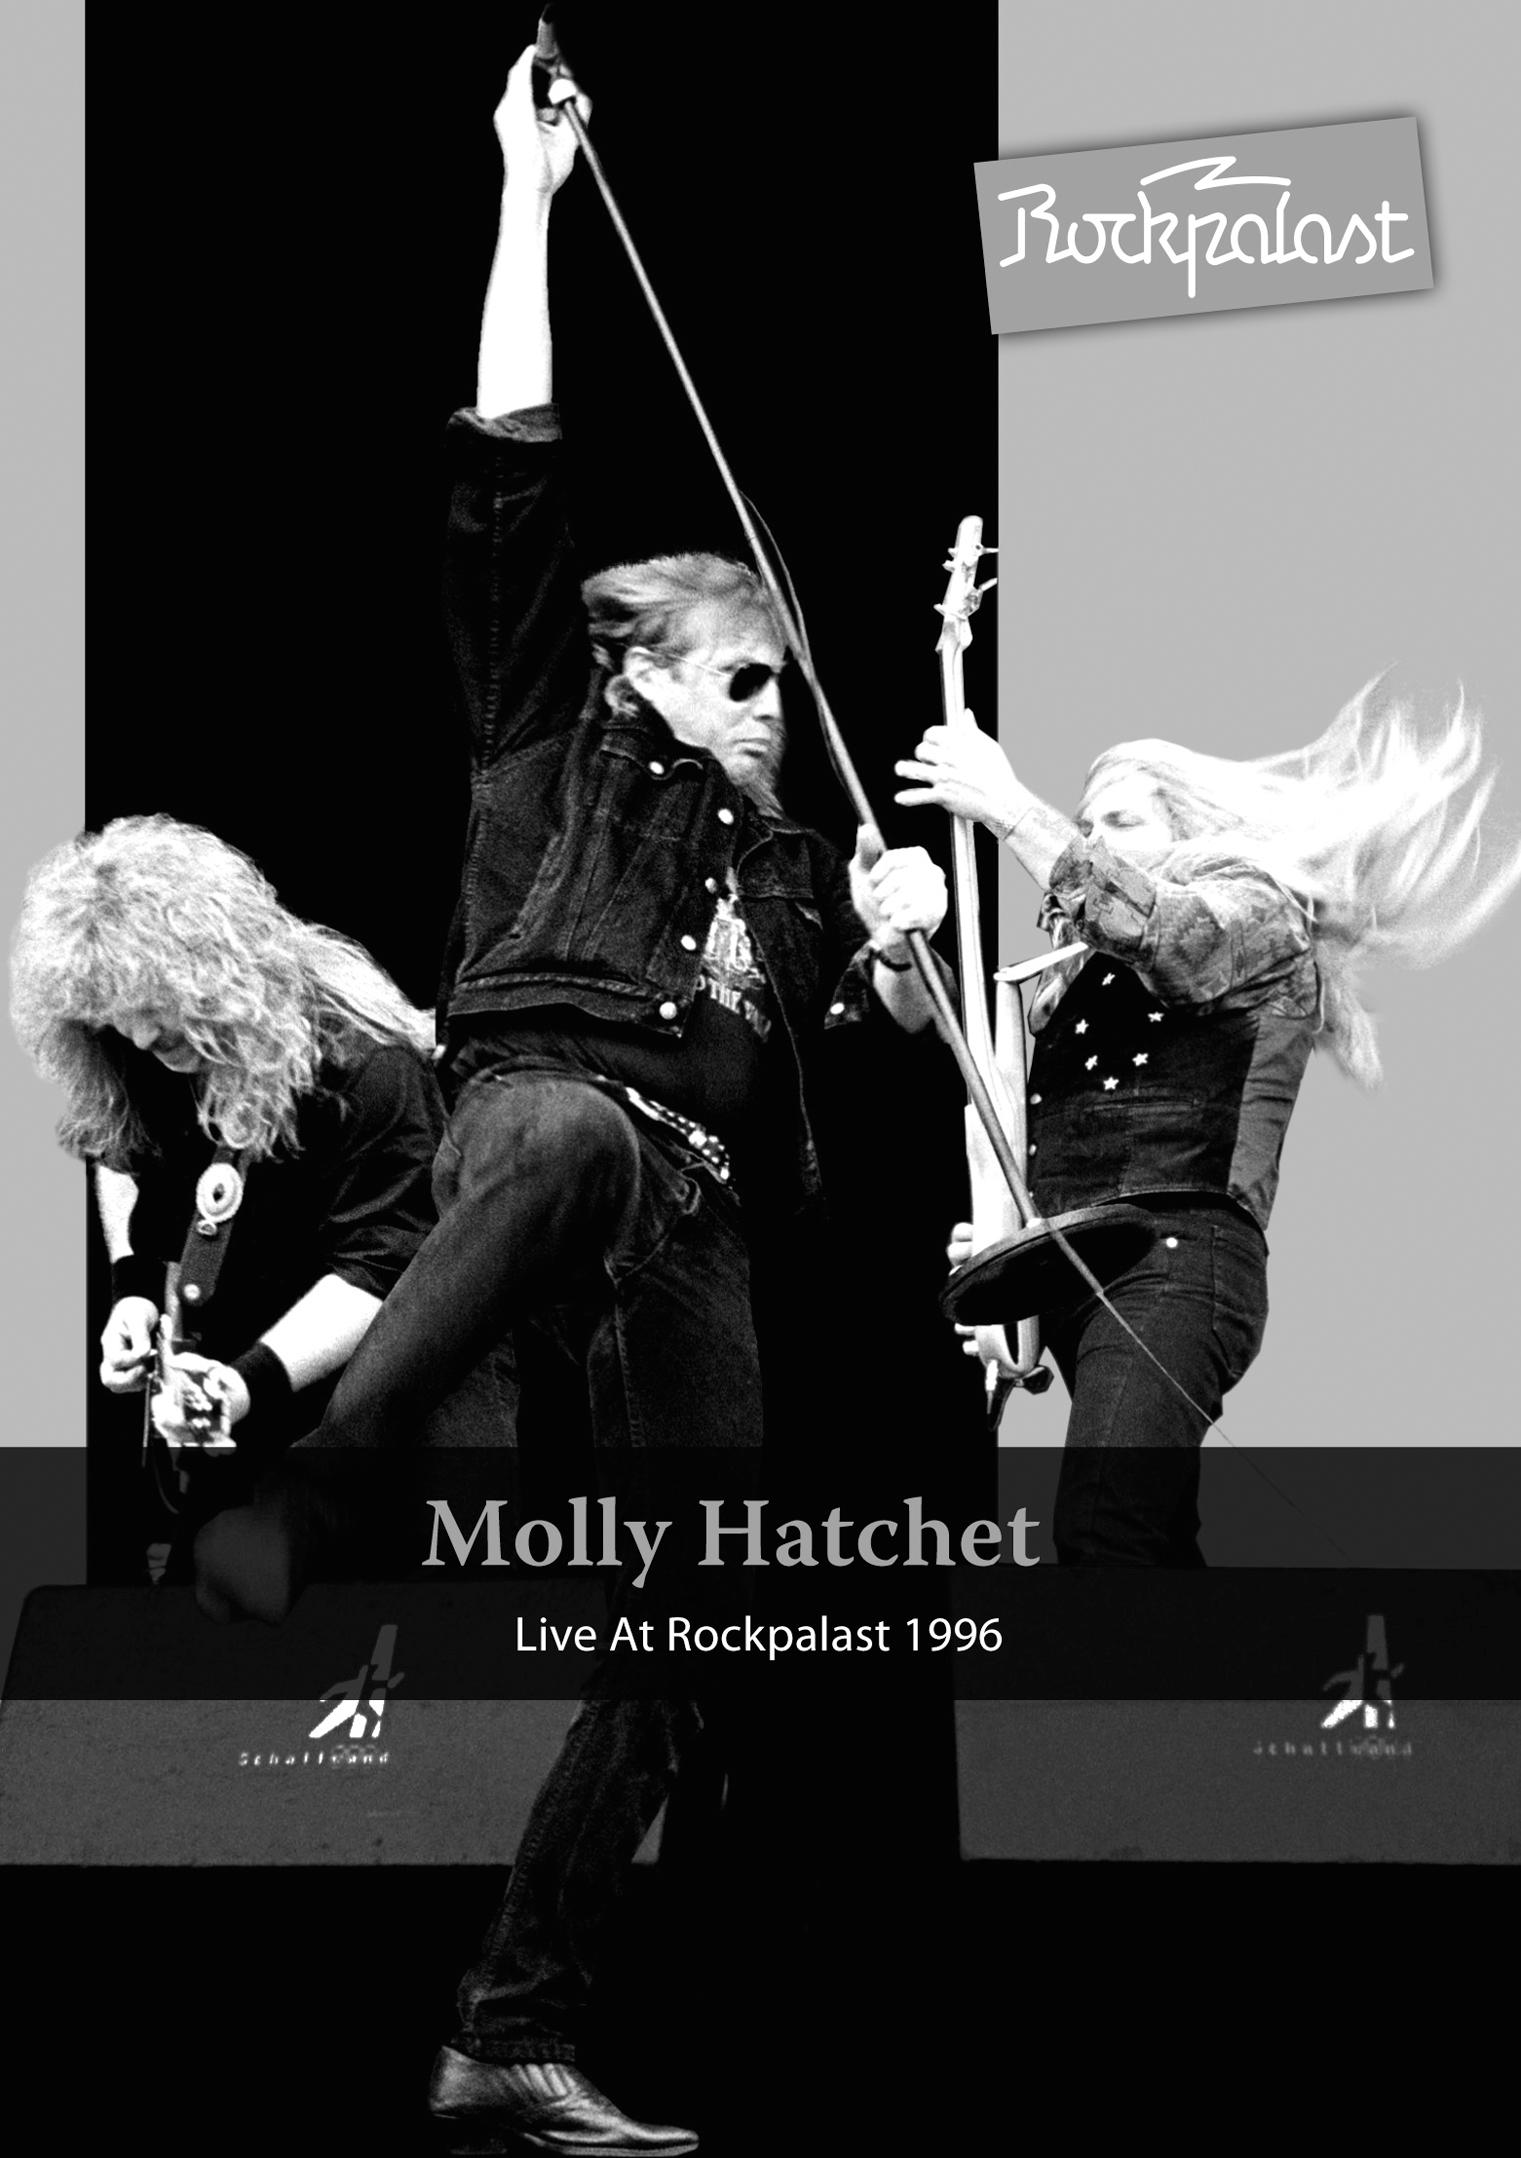 Molly Hatchet: Live at Rockpalast